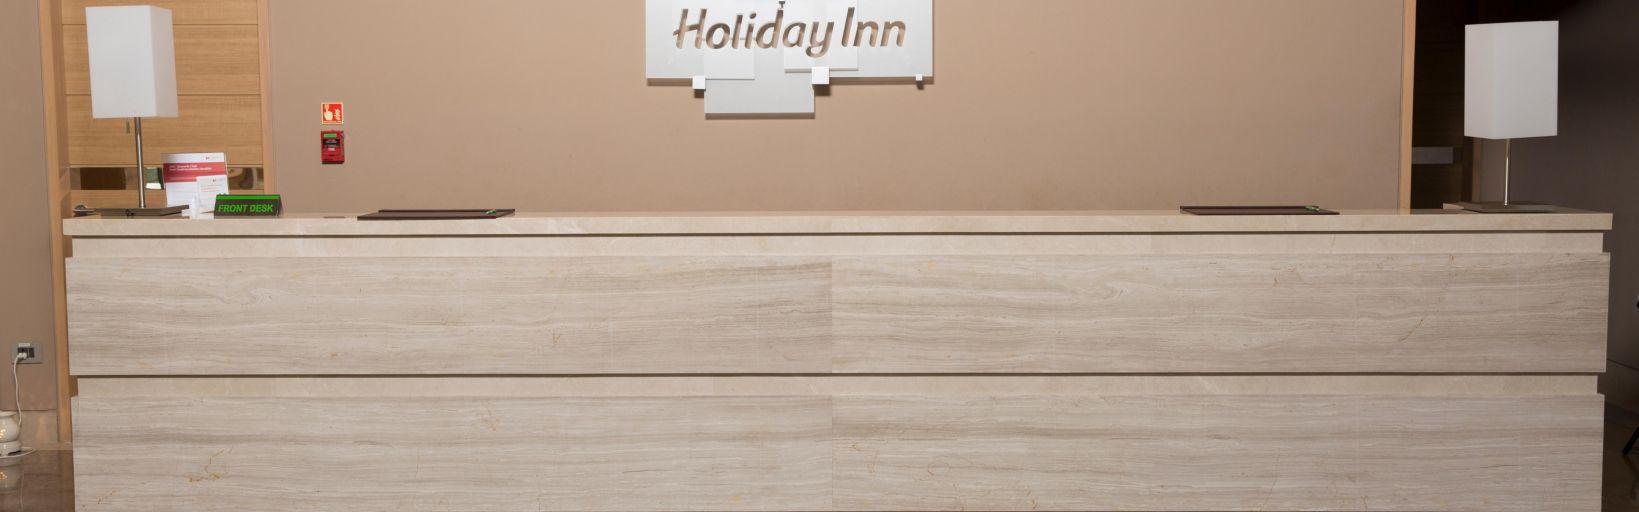 Holiday inn chennai omr it expressway hotel by ihg holiday inn chennai omr it expressway solutioingenieria Choice Image